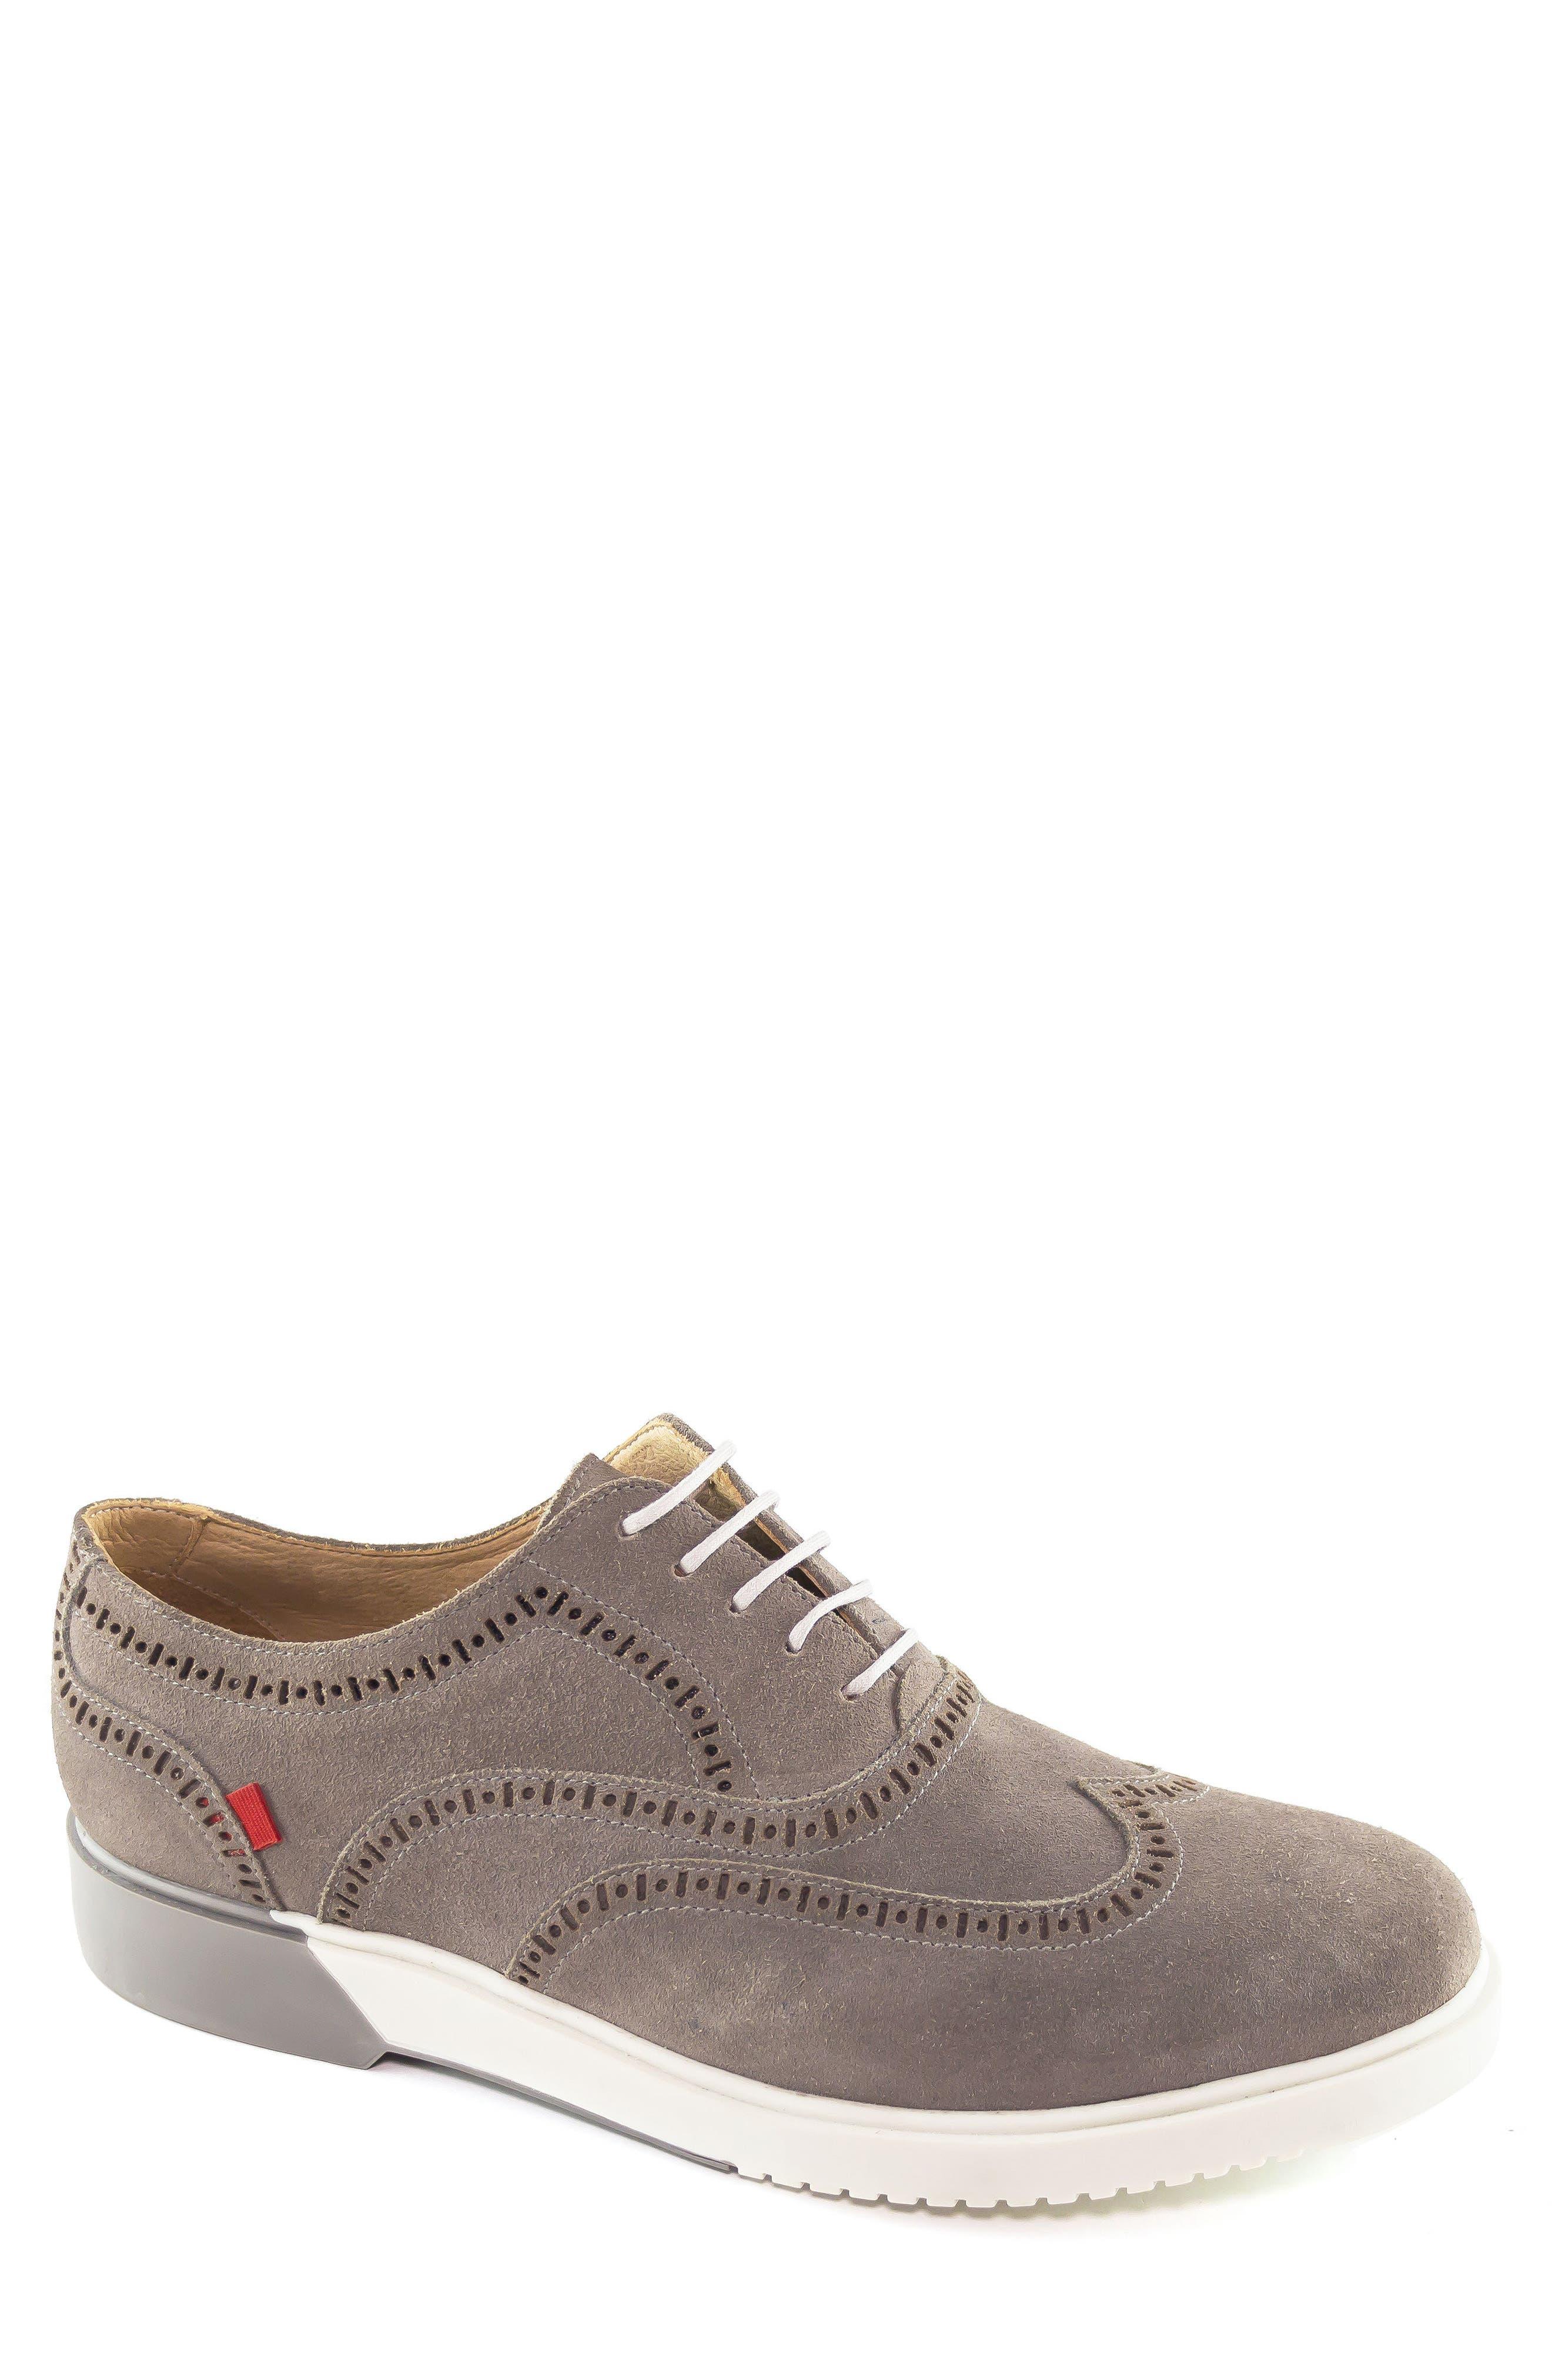 Alternate Image 1 Selected - Marc Joseph New York 5th Ave Wingtip Sneaker (Men)